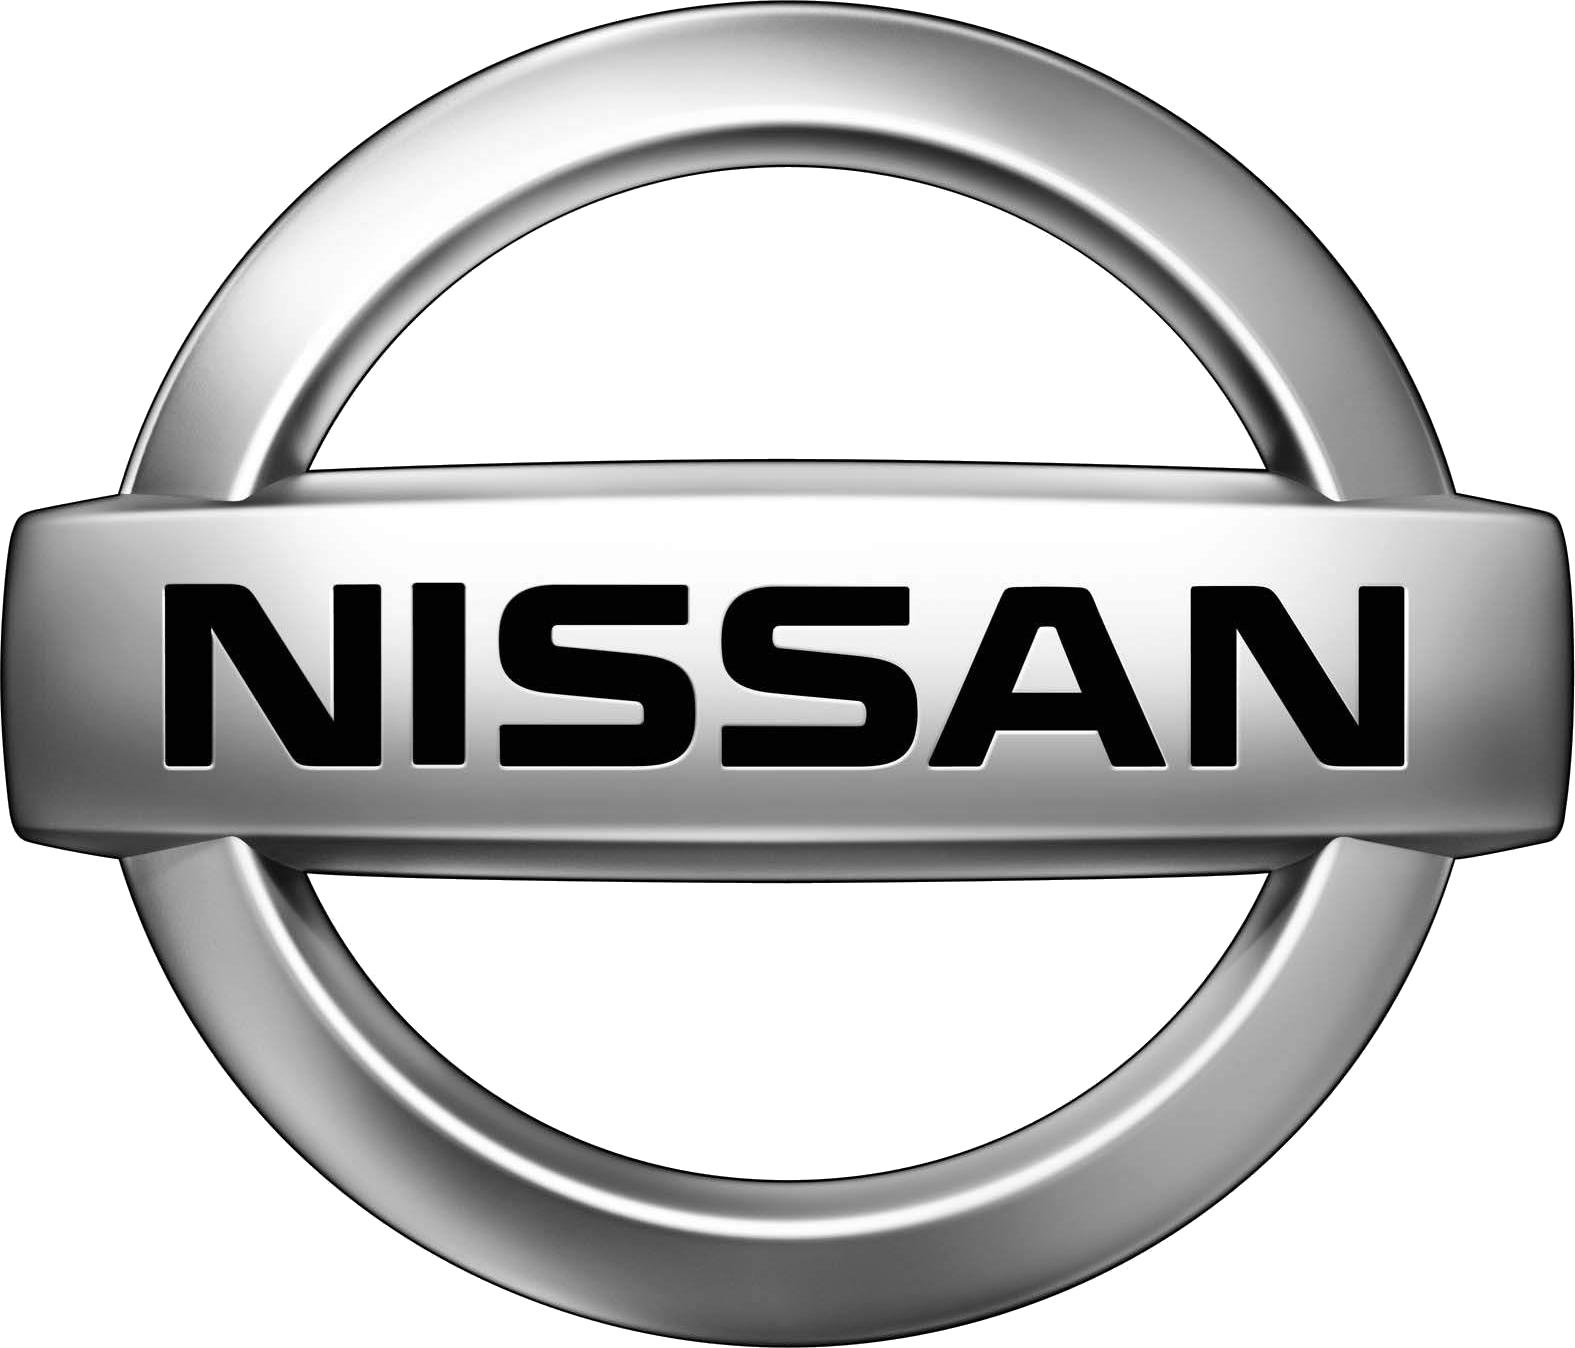 nissan_logo_PNG1658